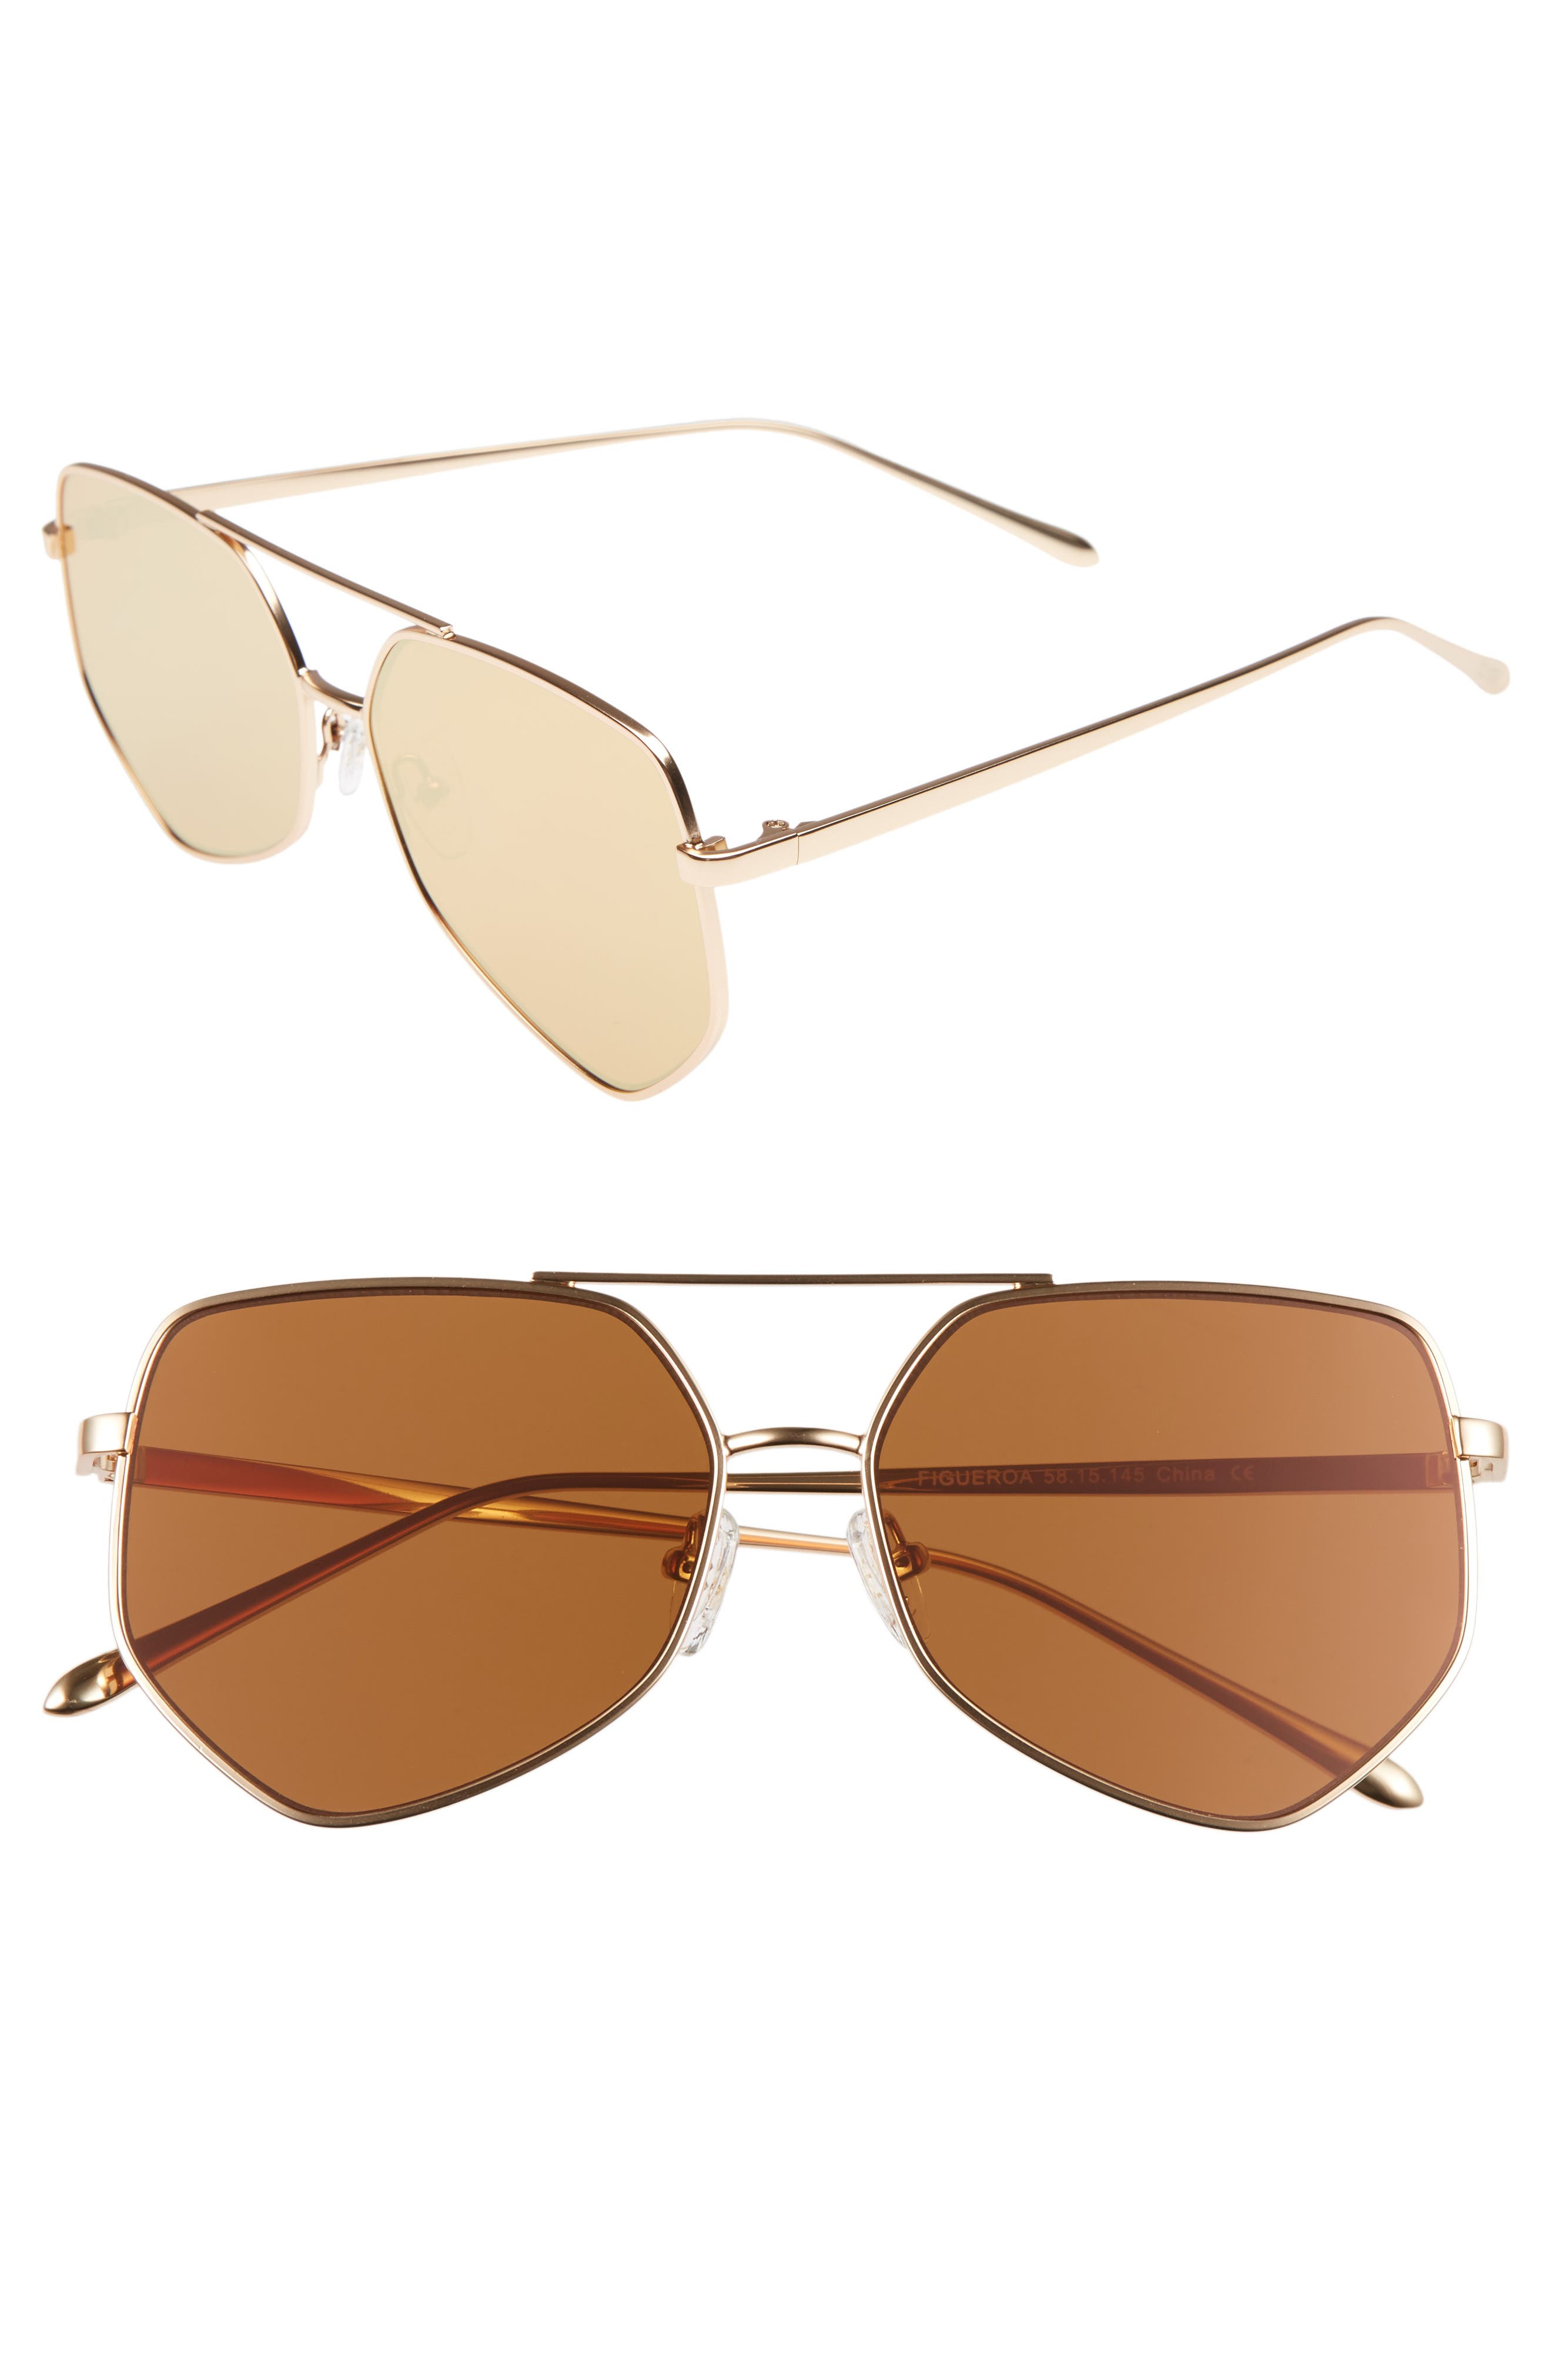 Figueroa 58mm Sunglasses,                             Main thumbnail 1, color,                             PALACE GOLD